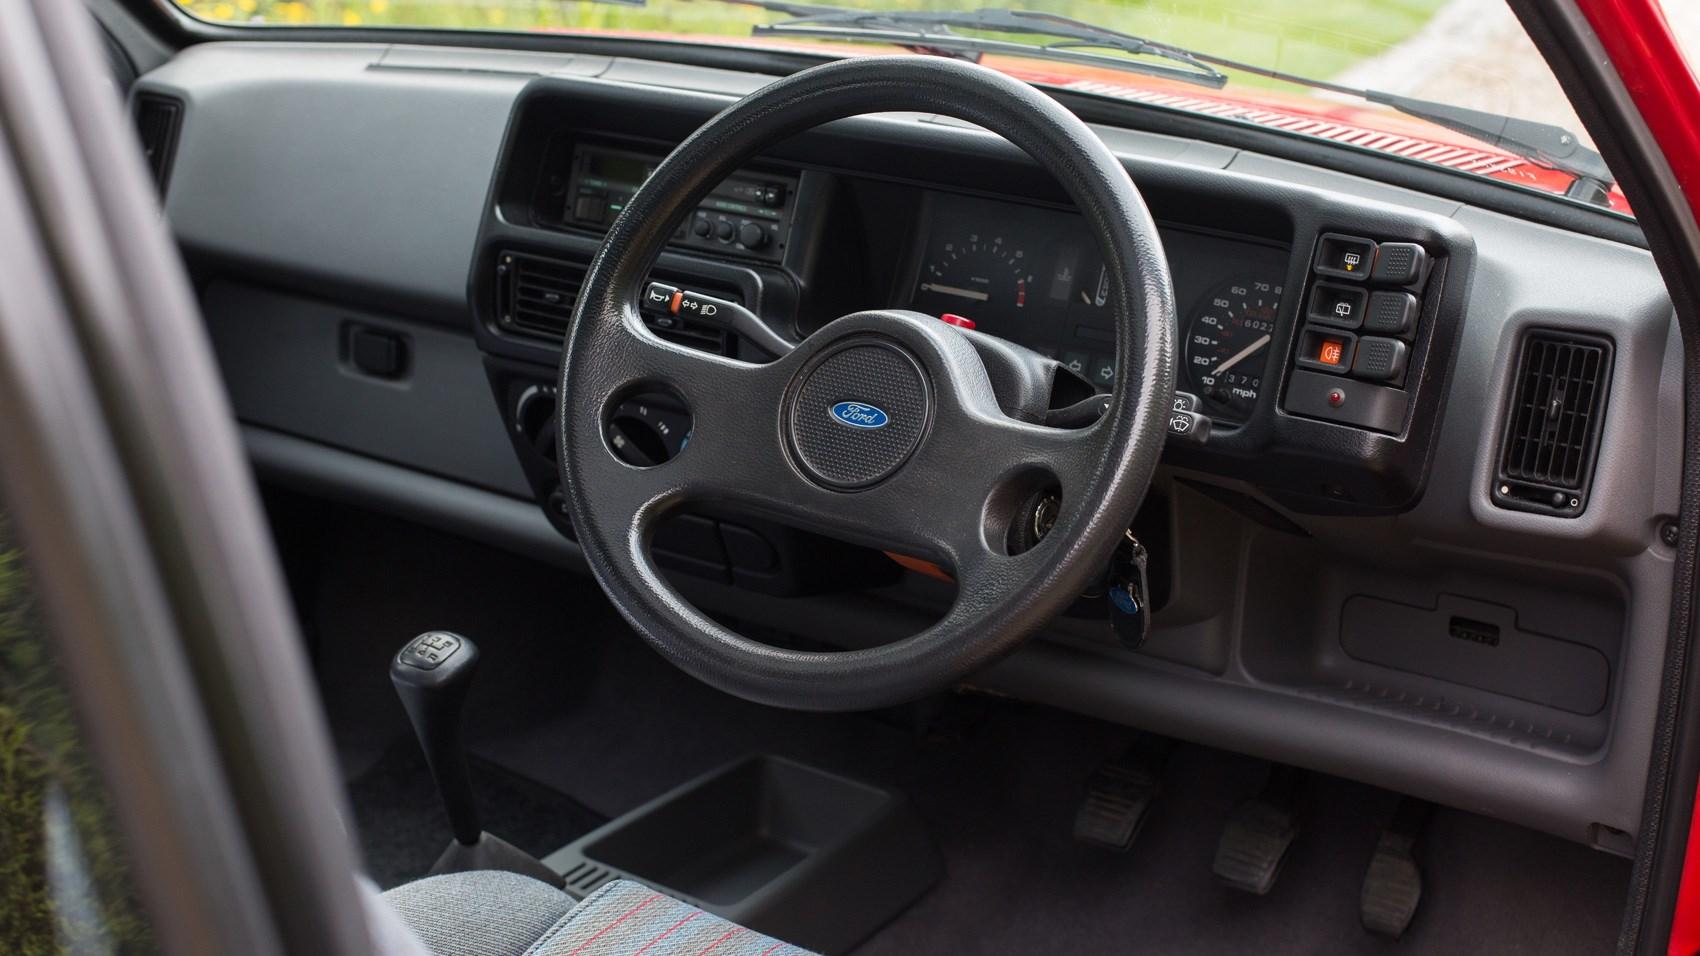 Ford Fiesta XR2 interior